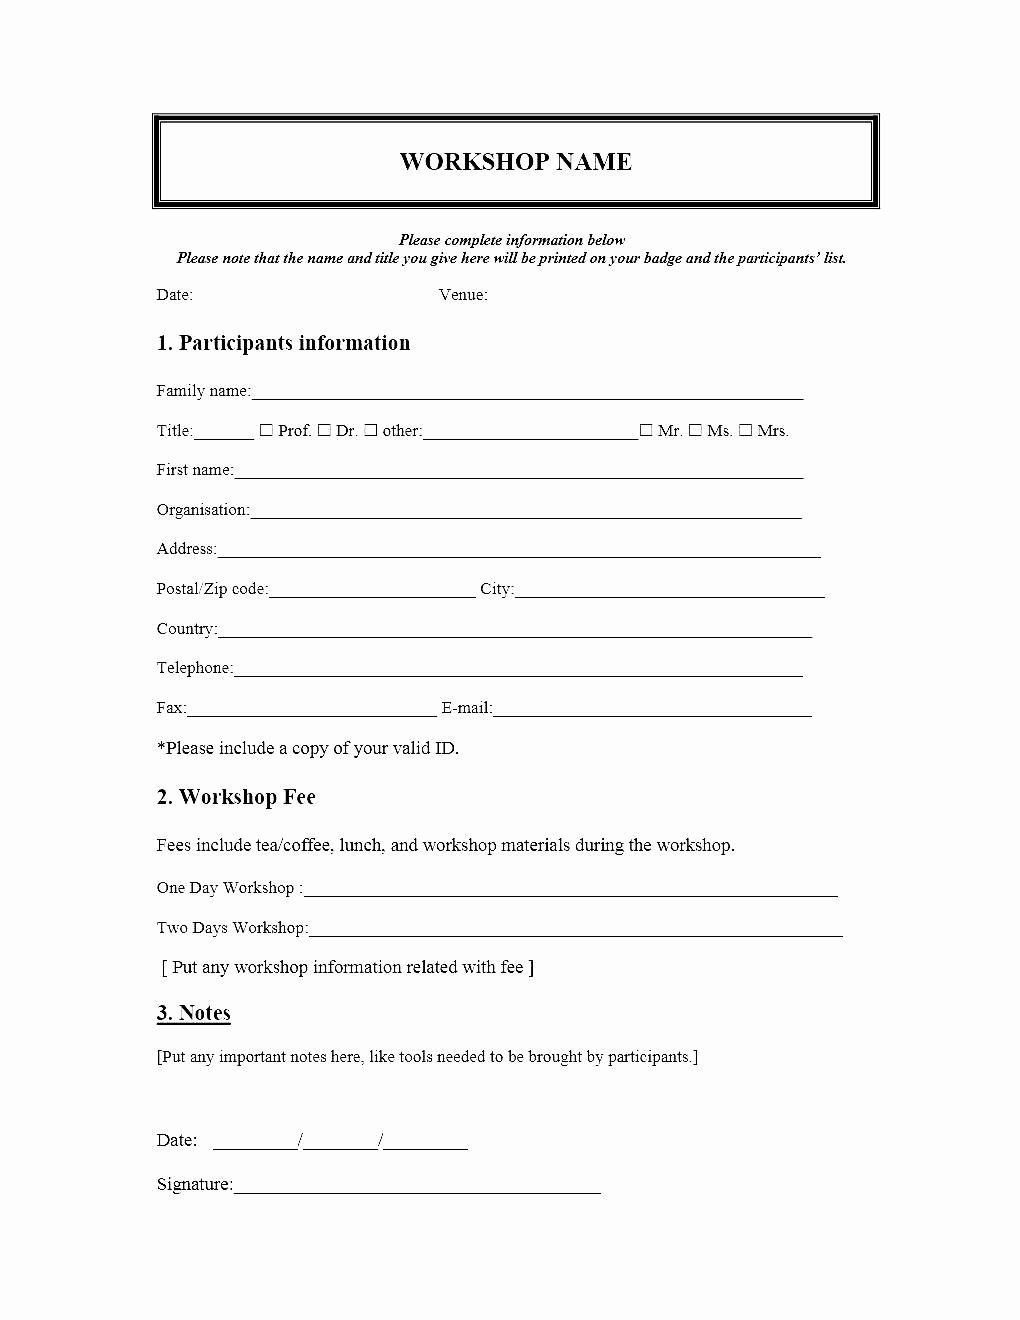 Registration form Template Microsoft Word Awesome event Registration form Template Microsoft Word